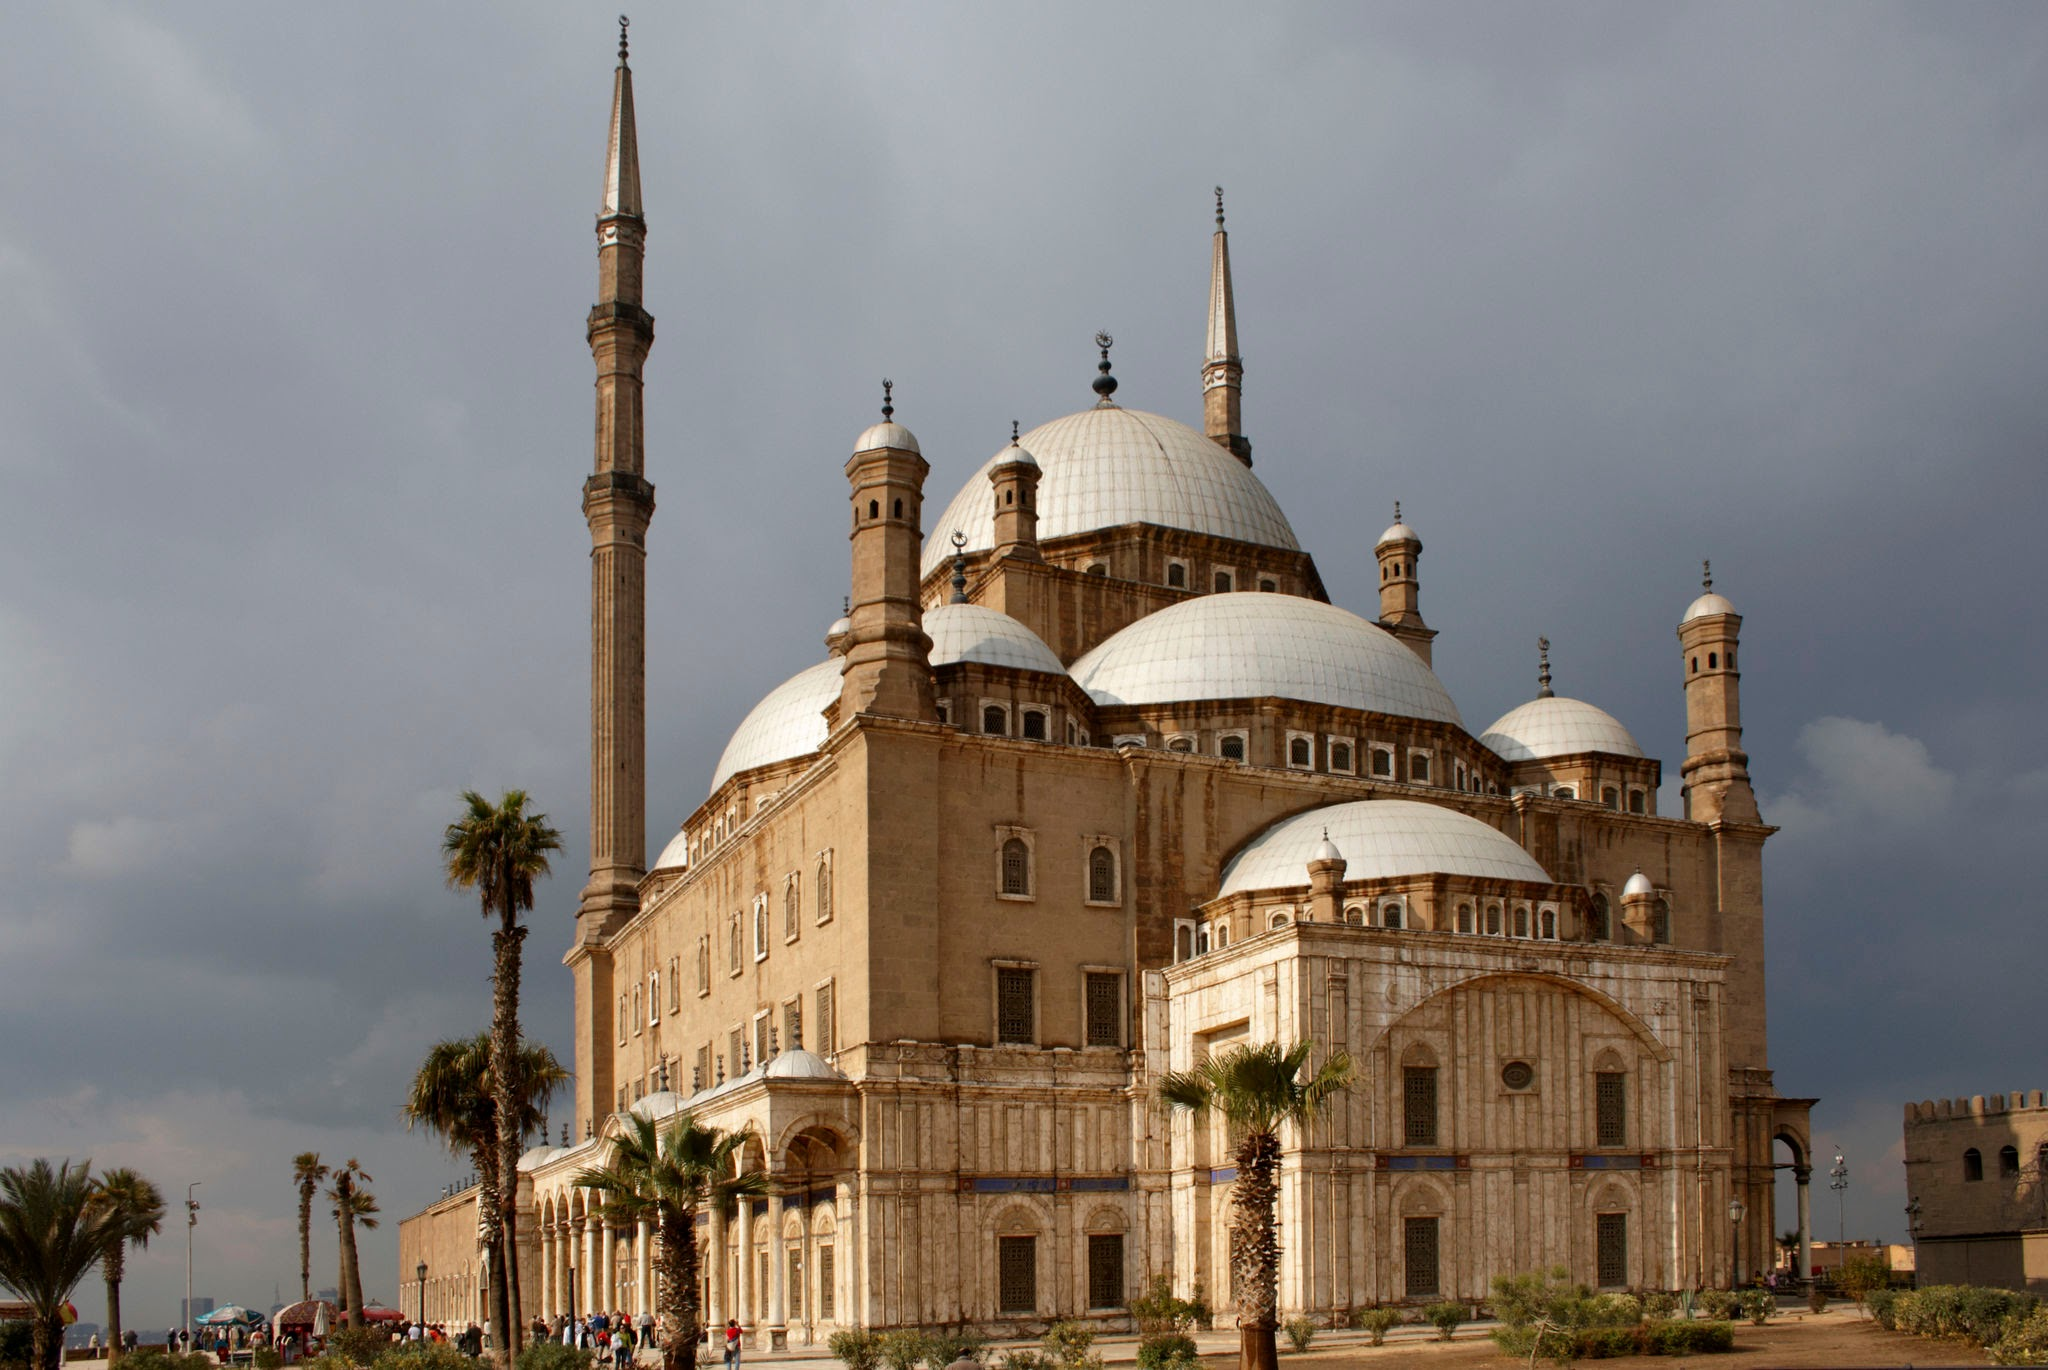 Salah Al-Din Al-Ayoubi Castle